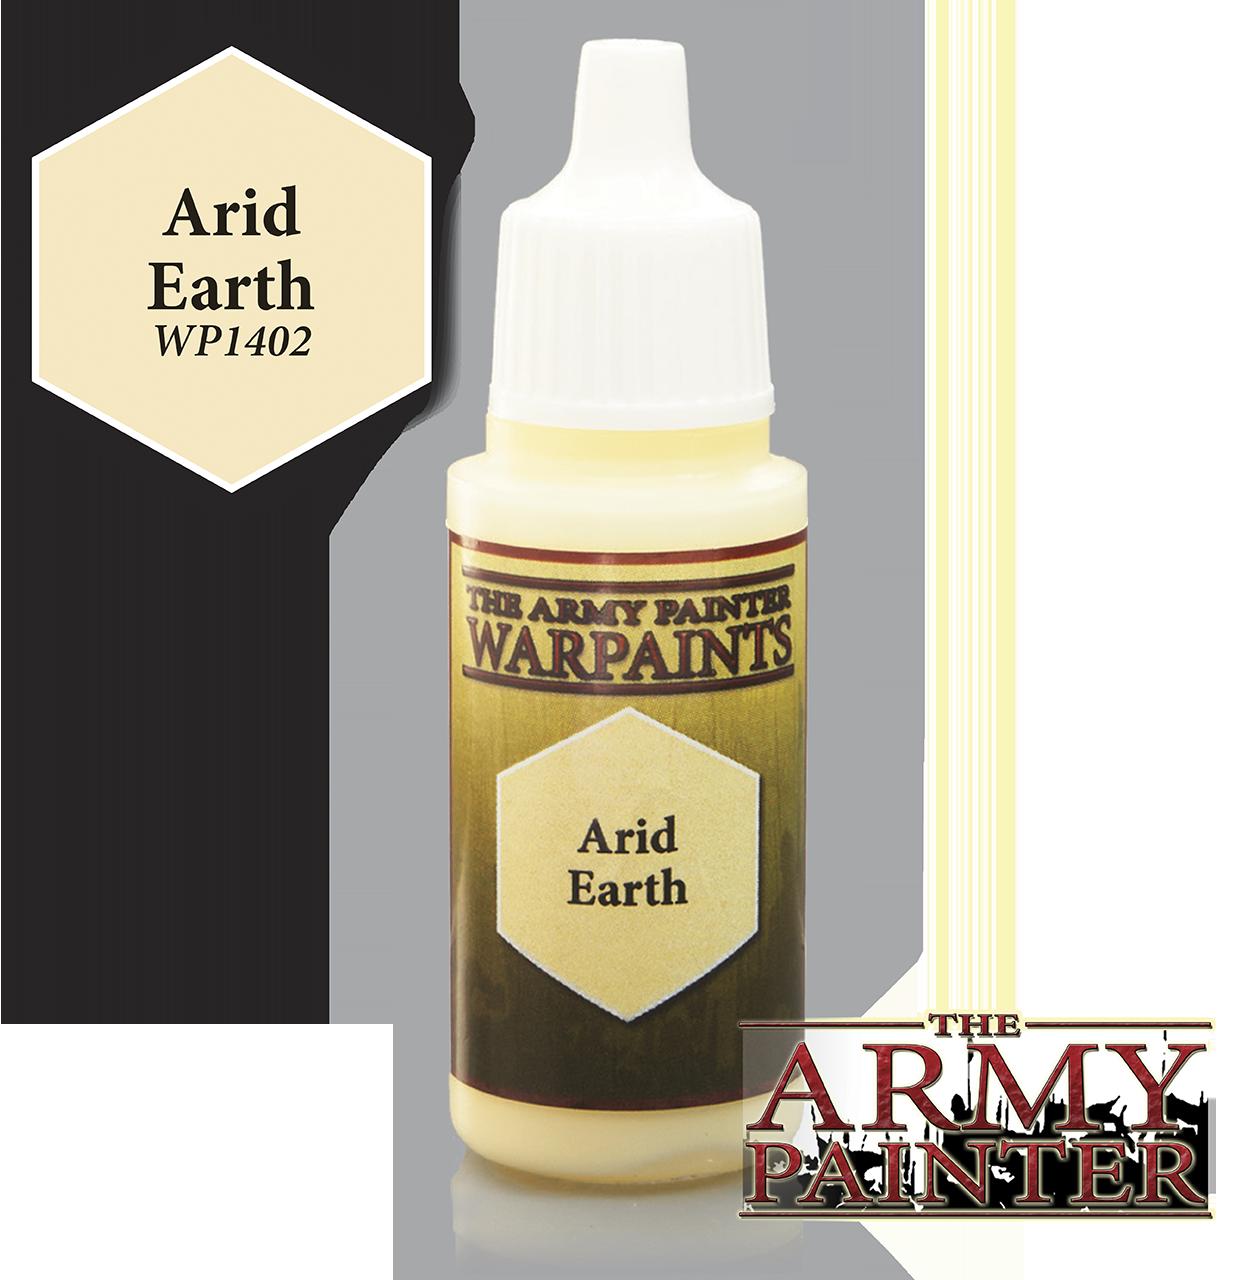 Arid Earth - Army Painter Warpaints WP1402